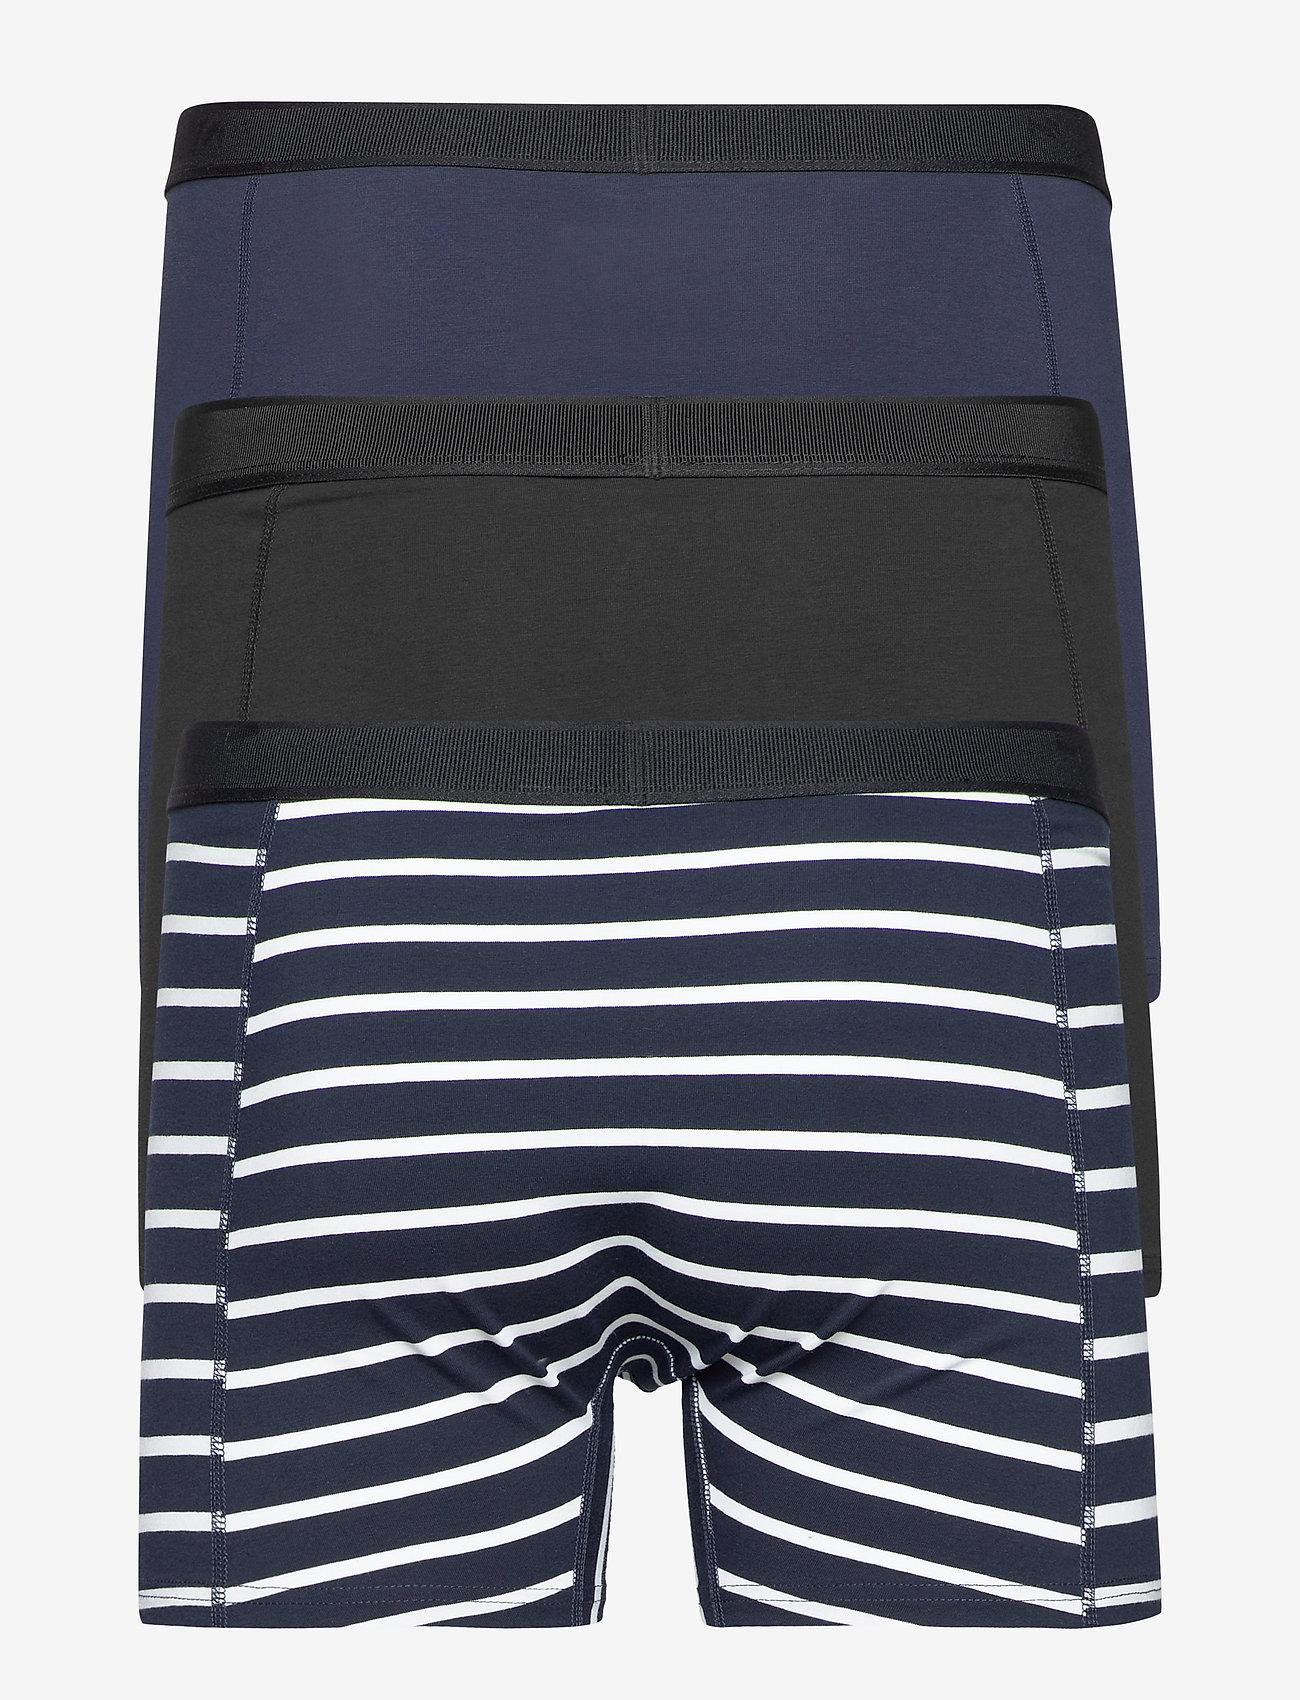 Björn Borg - SHORTS SAMMY BB SINGLE STRIPE - underwear - black beauty - 1